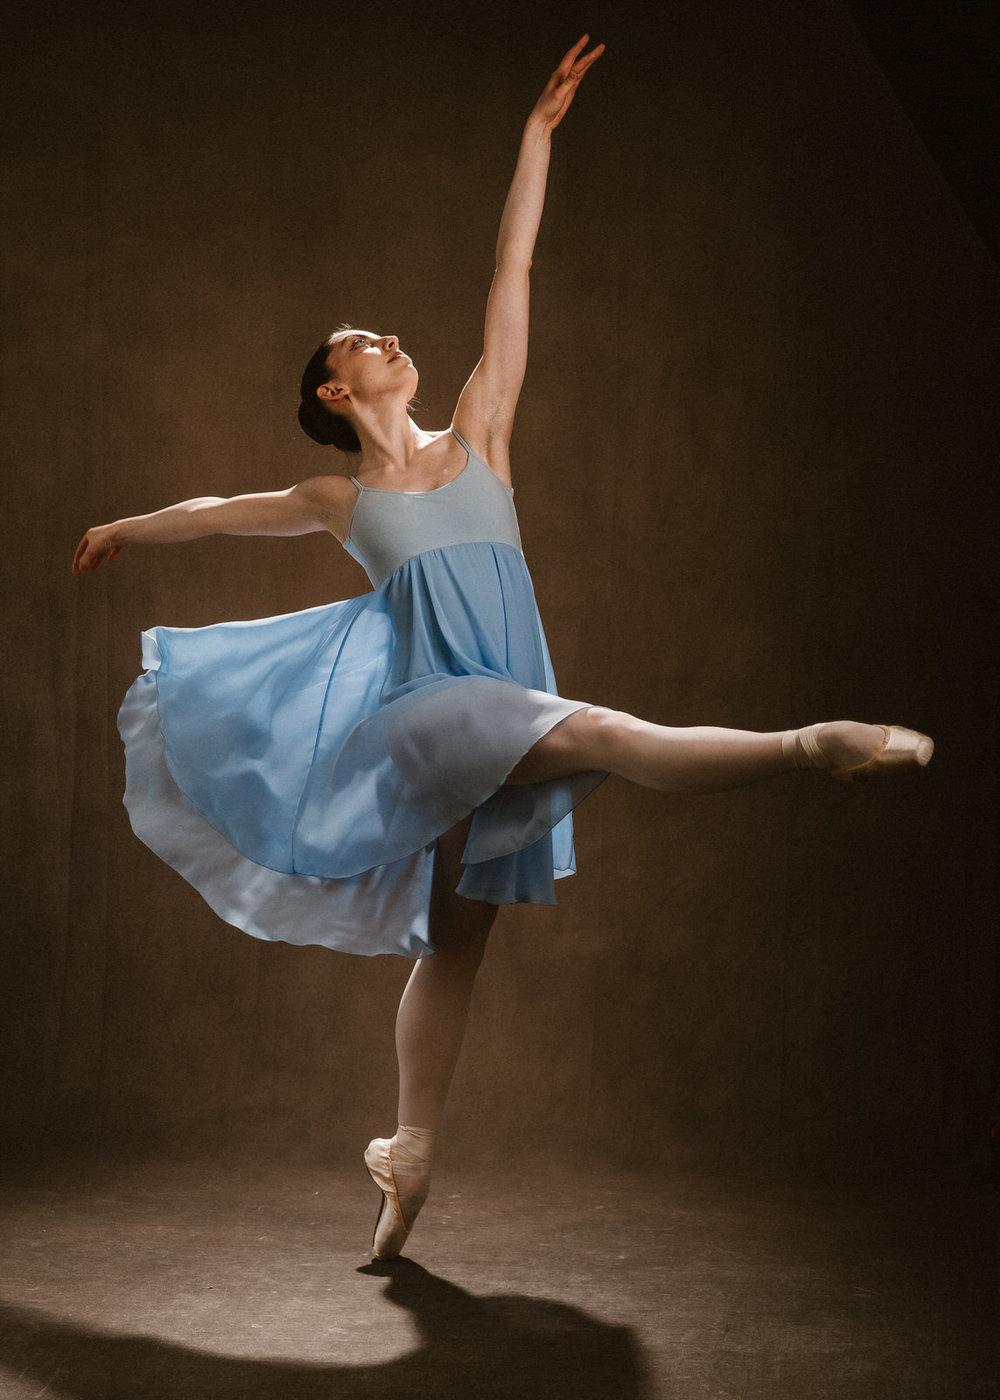 Sarah_Nolan_Ballet_011.jpg